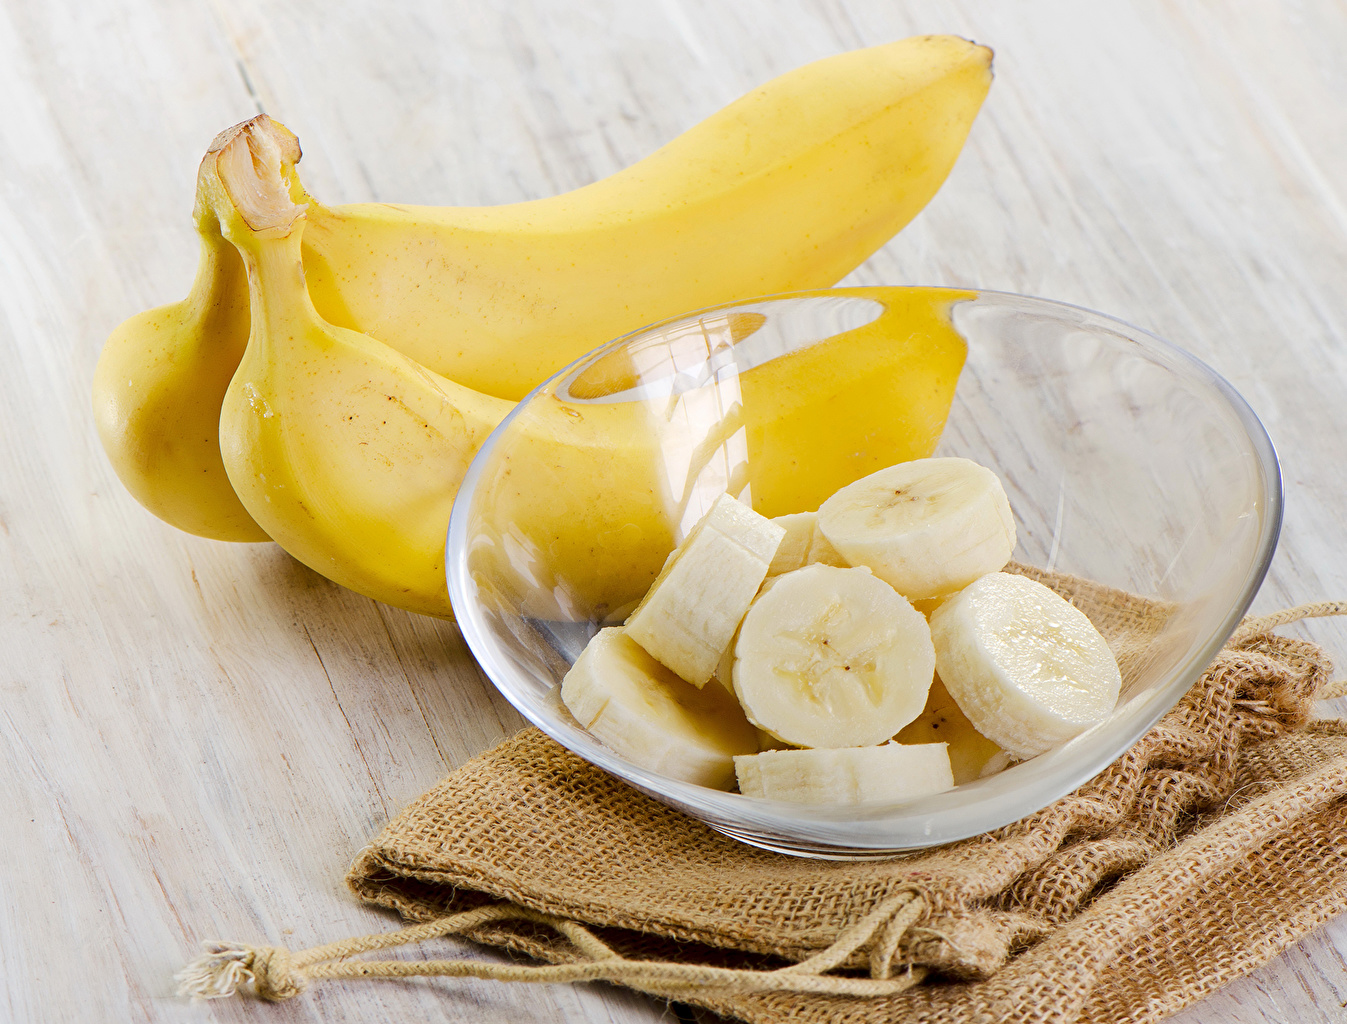 Фотография Бананы Еда Фрукты Тарелка Пища тарелке Продукты питания